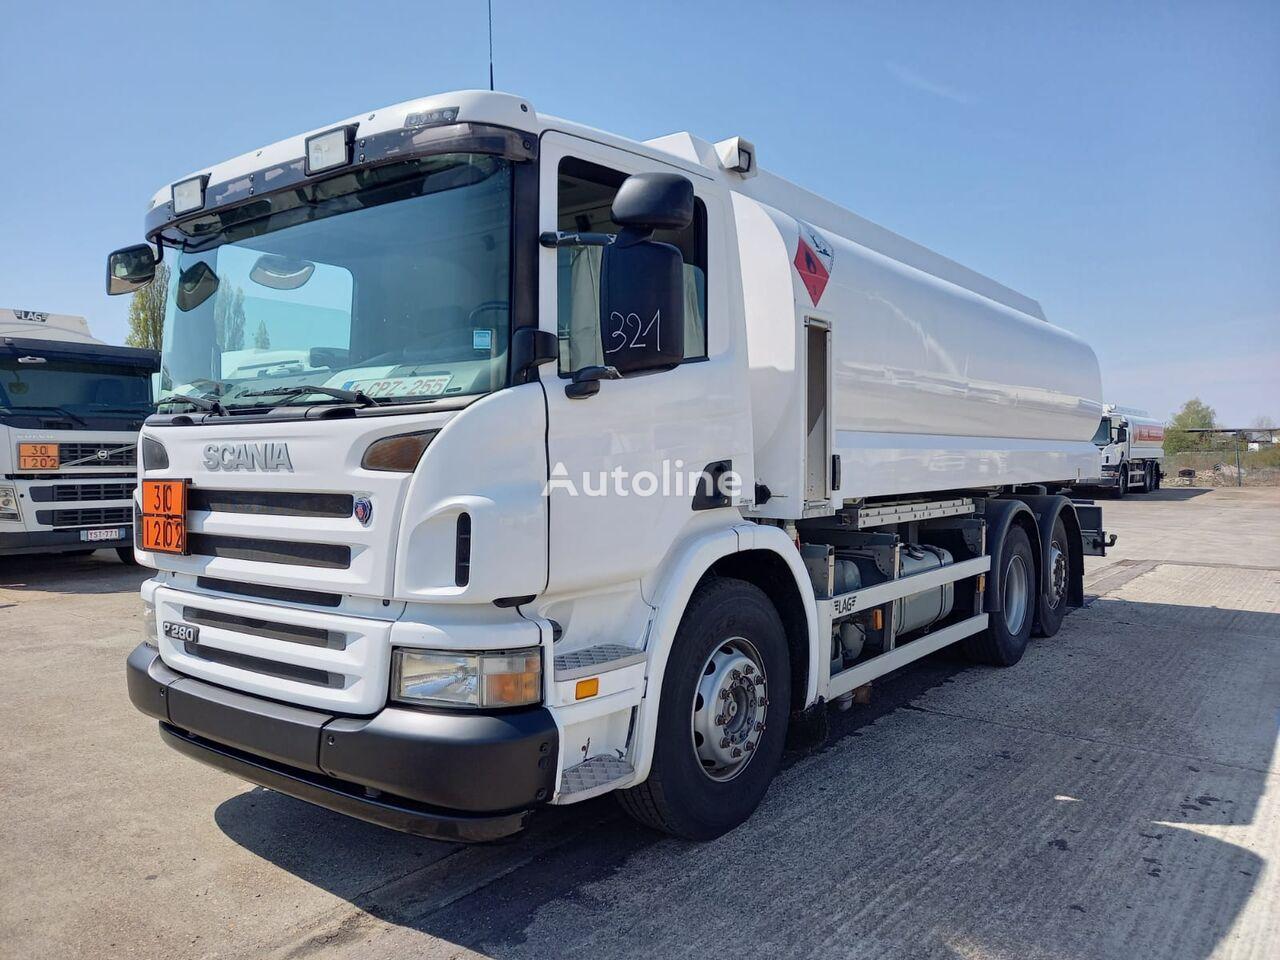 SCANIA camión de combustible